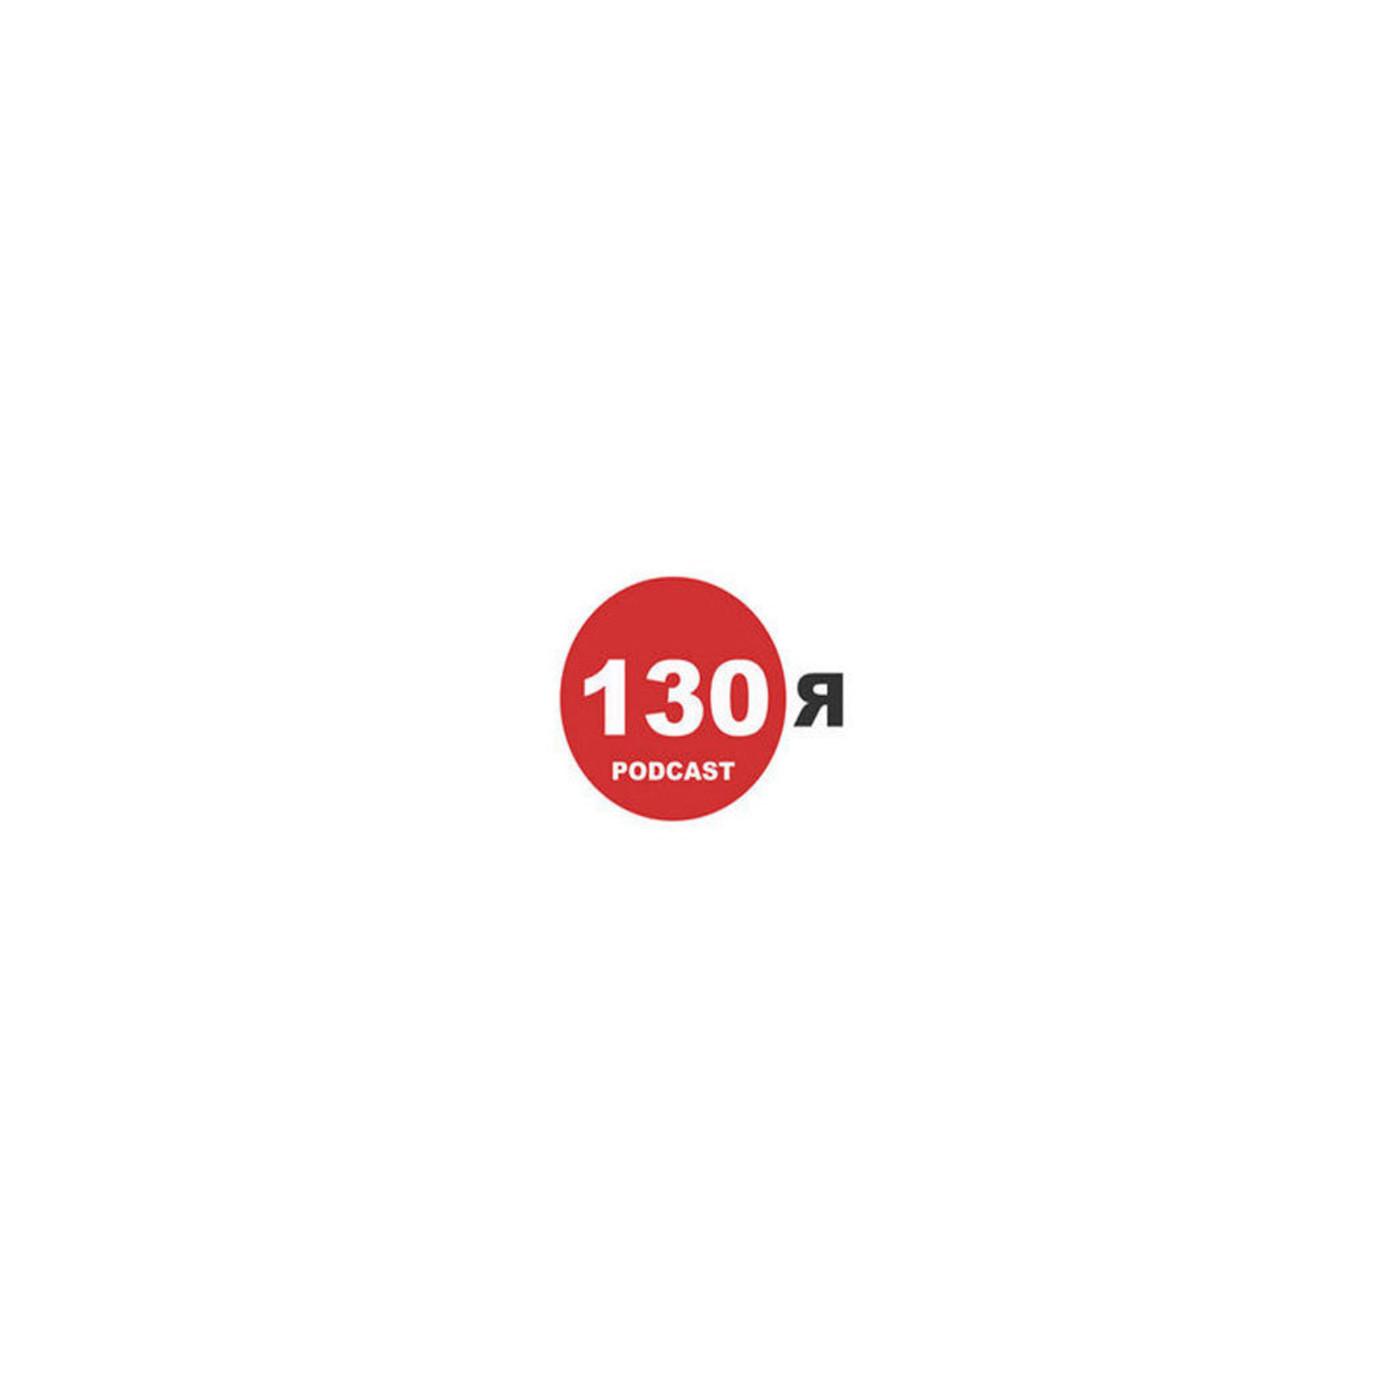 <![CDATA[130R Podcast]]>